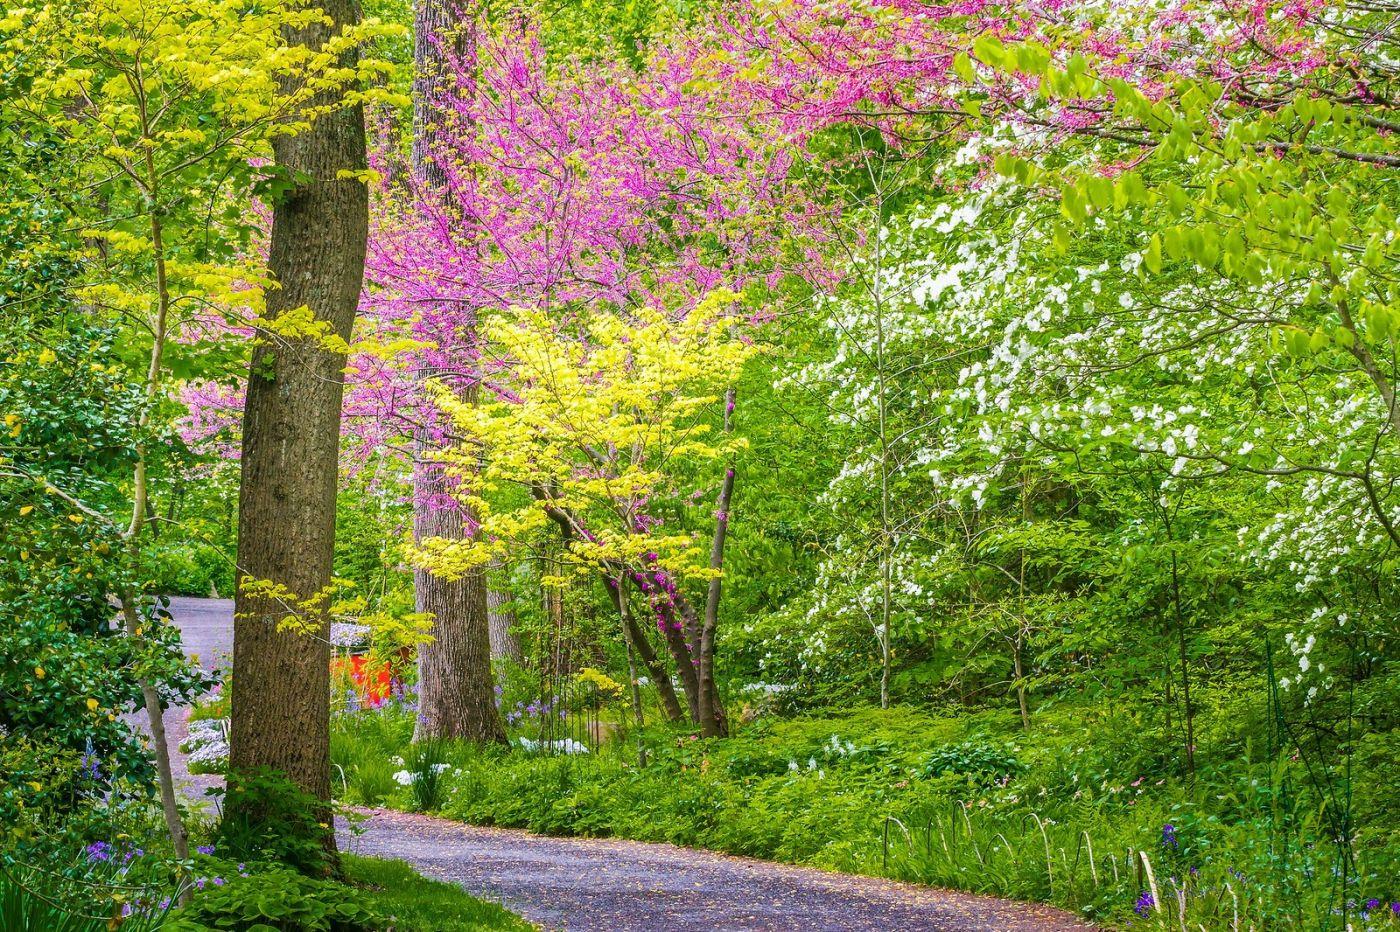 Chanticleer花园,有梦想的季节_图1-1